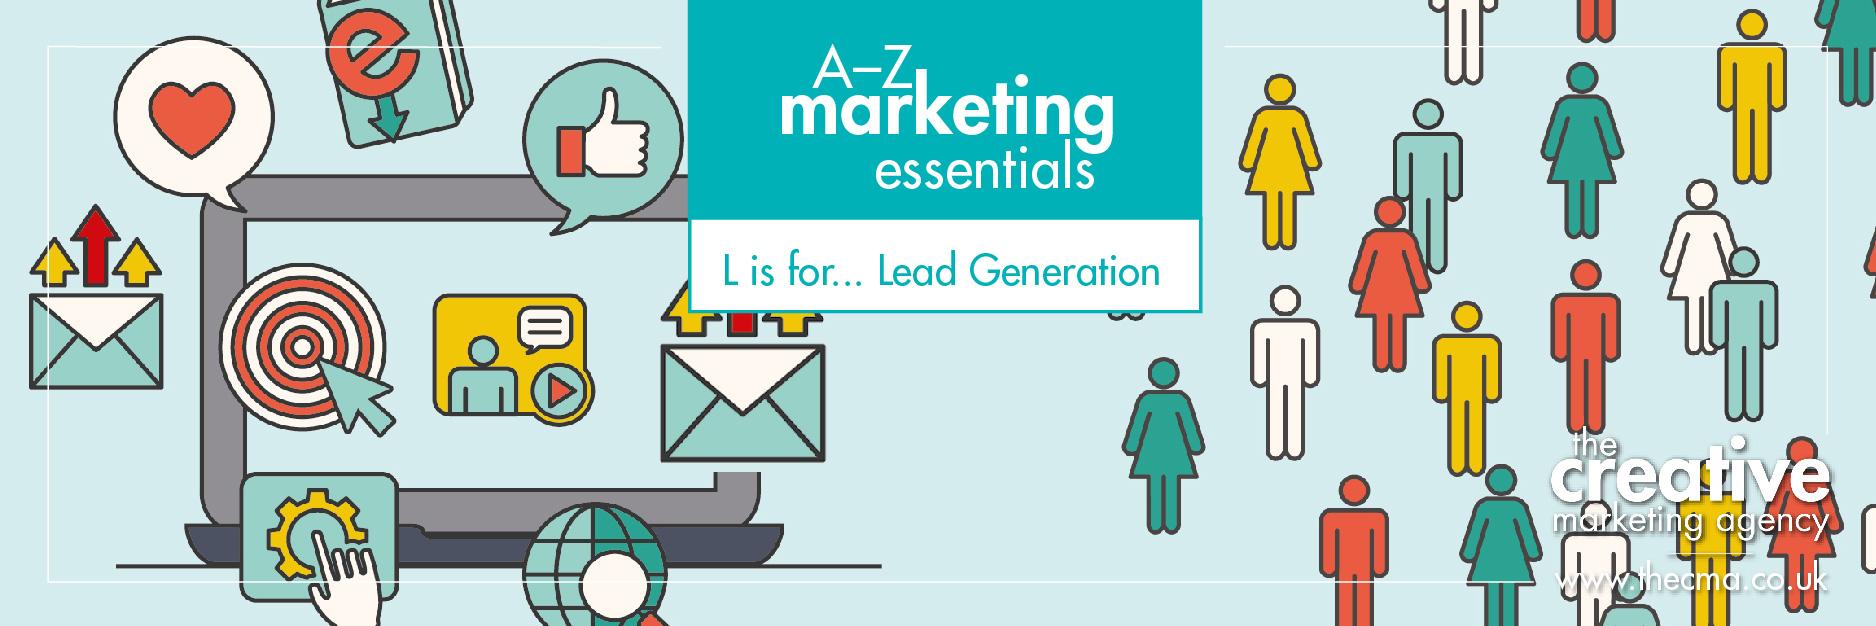 A_Z Social_Lead Generation_Blog